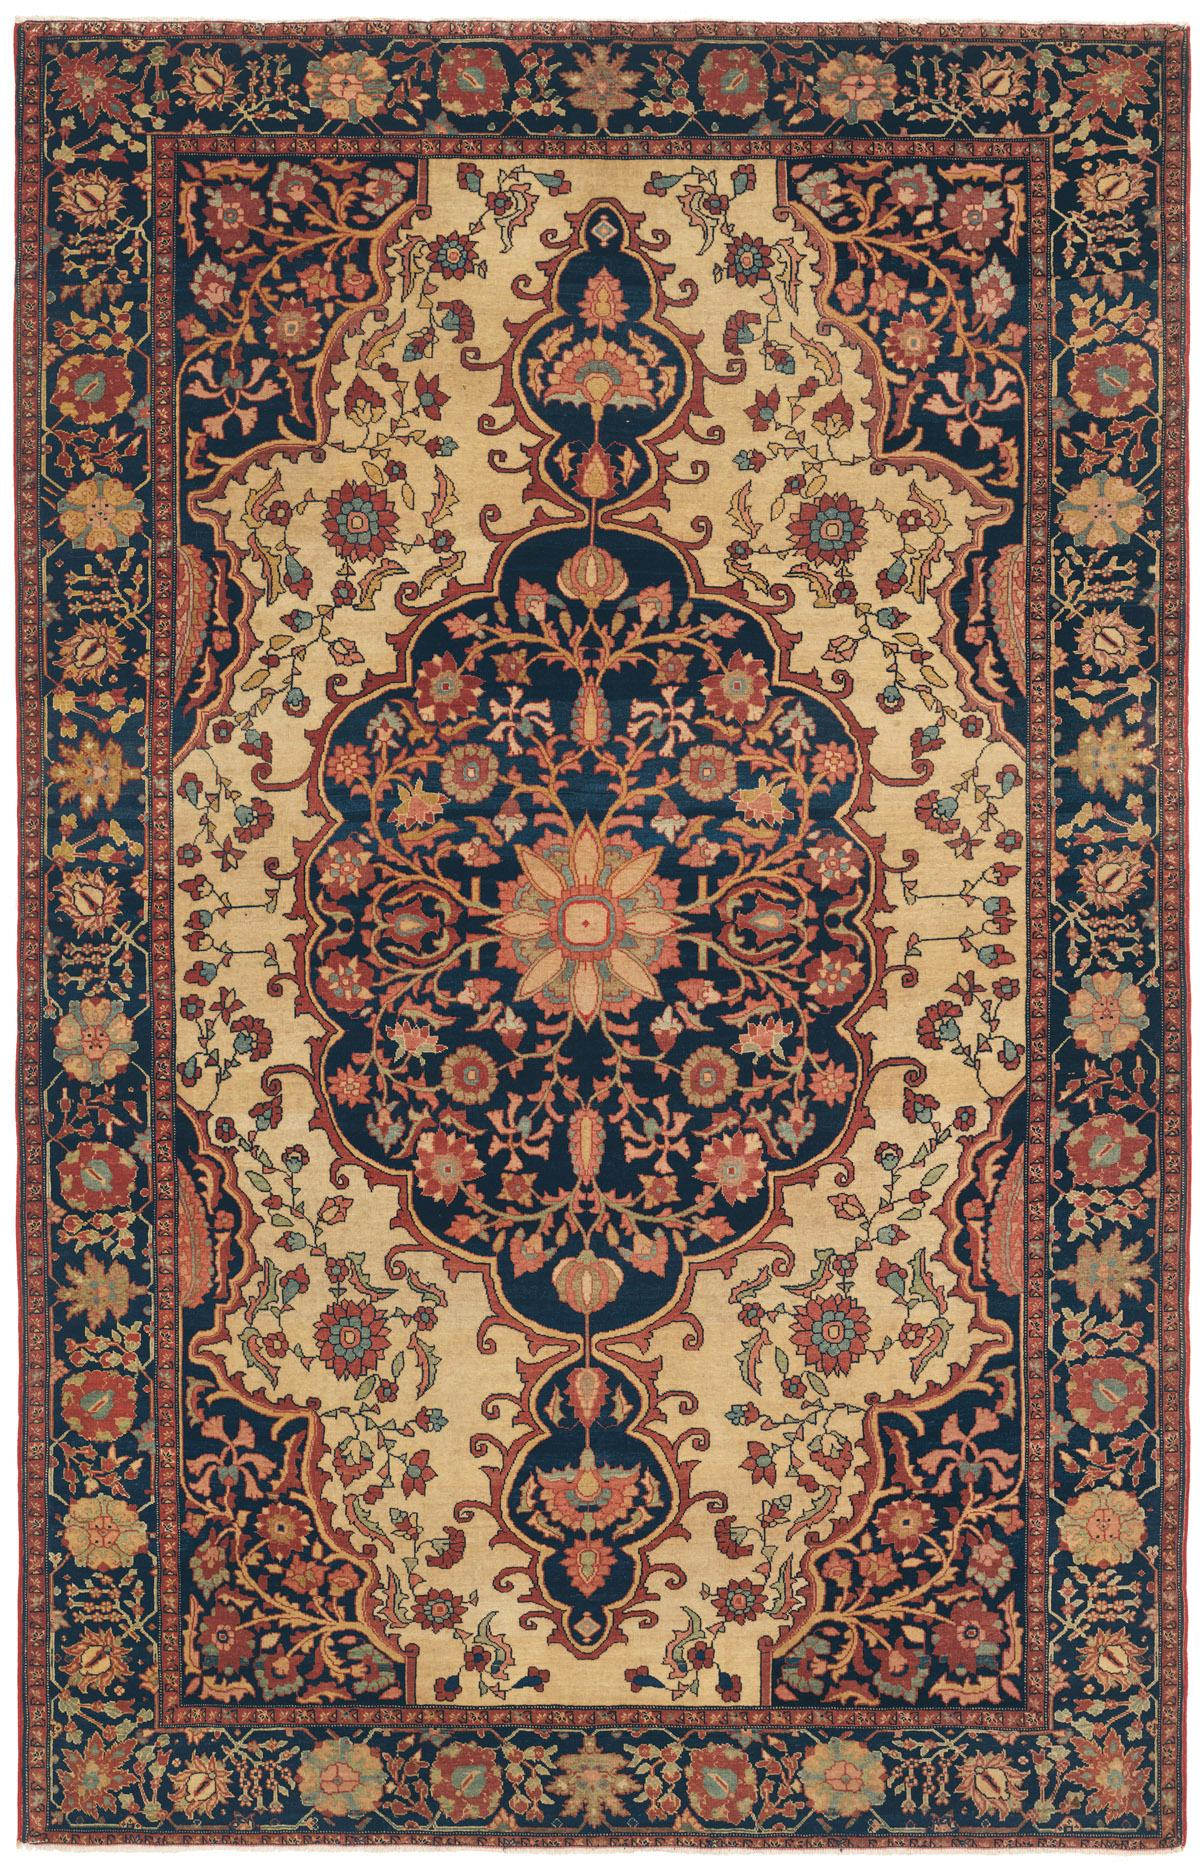 FERAHAN SAROUK West Central Persian Antique Rug  Claremont Rug Company